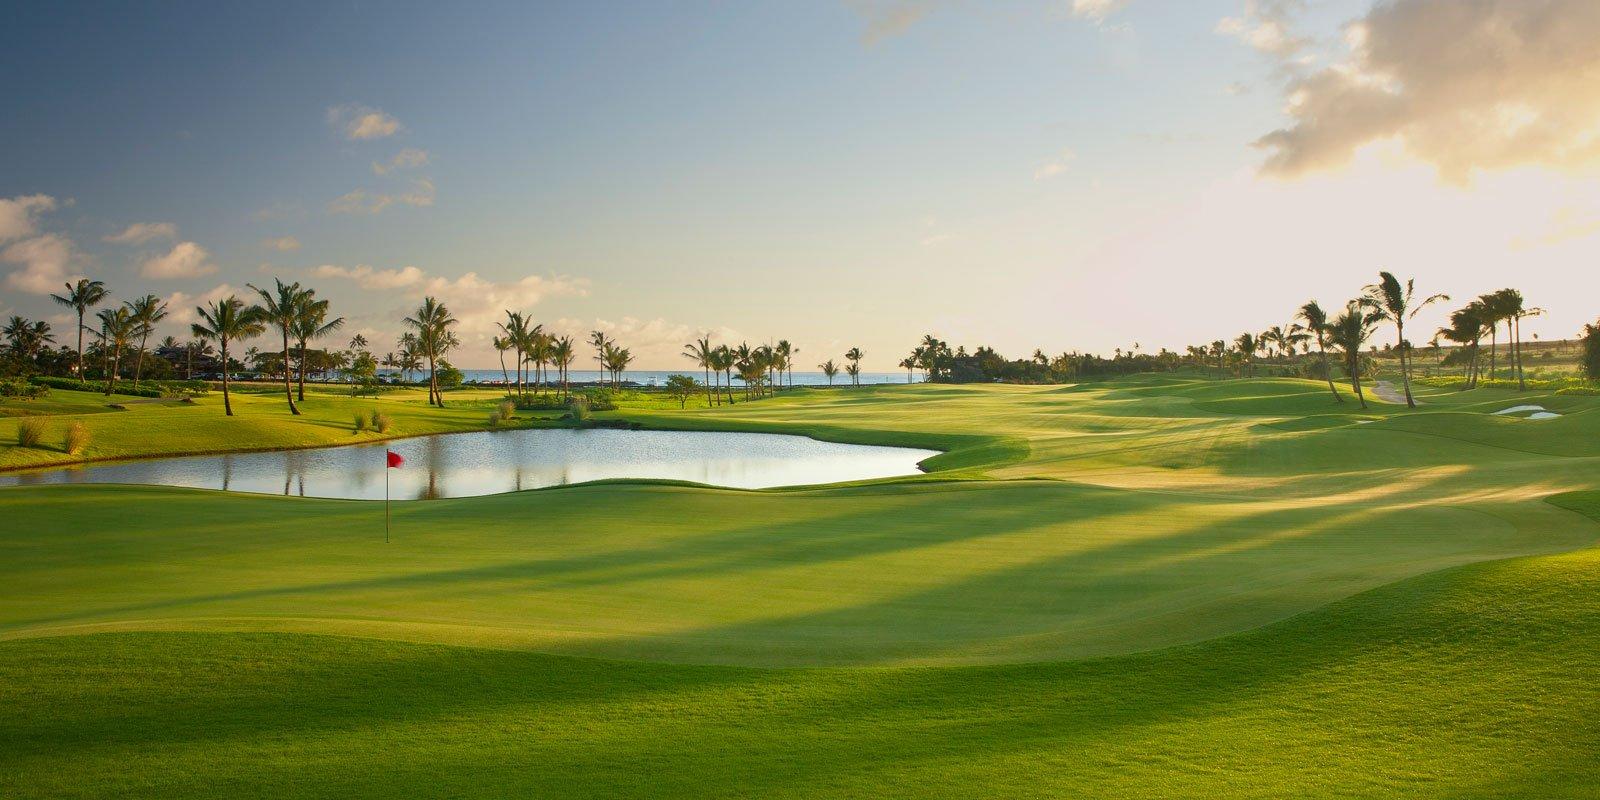 18th hole at kukuiula golf course